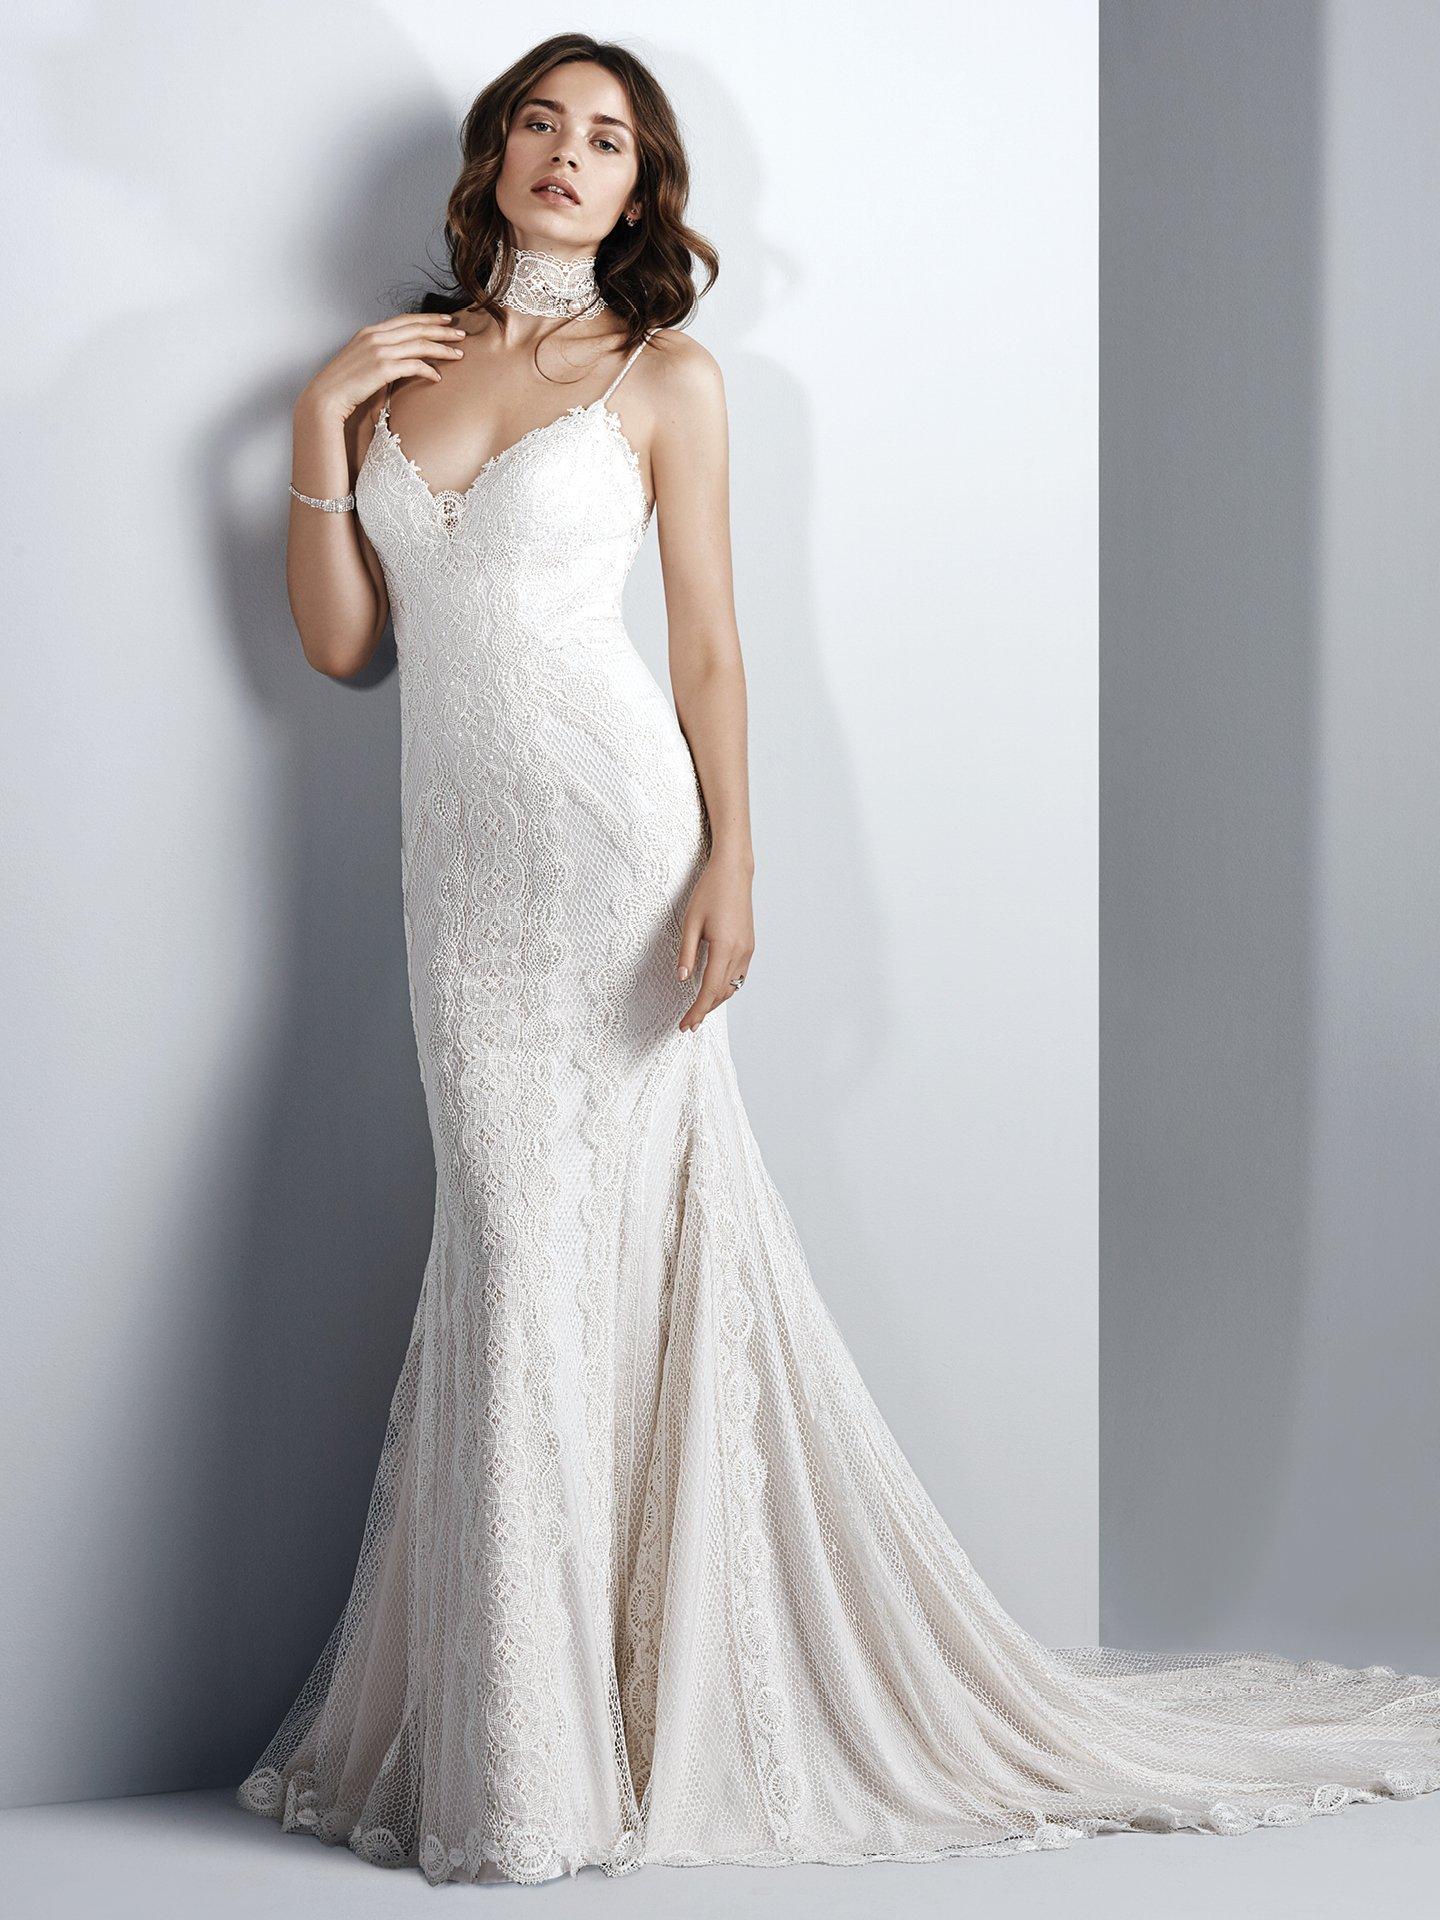 Spaghetti Strap Sweetheart Neck Lace Sheath Wedding Dress